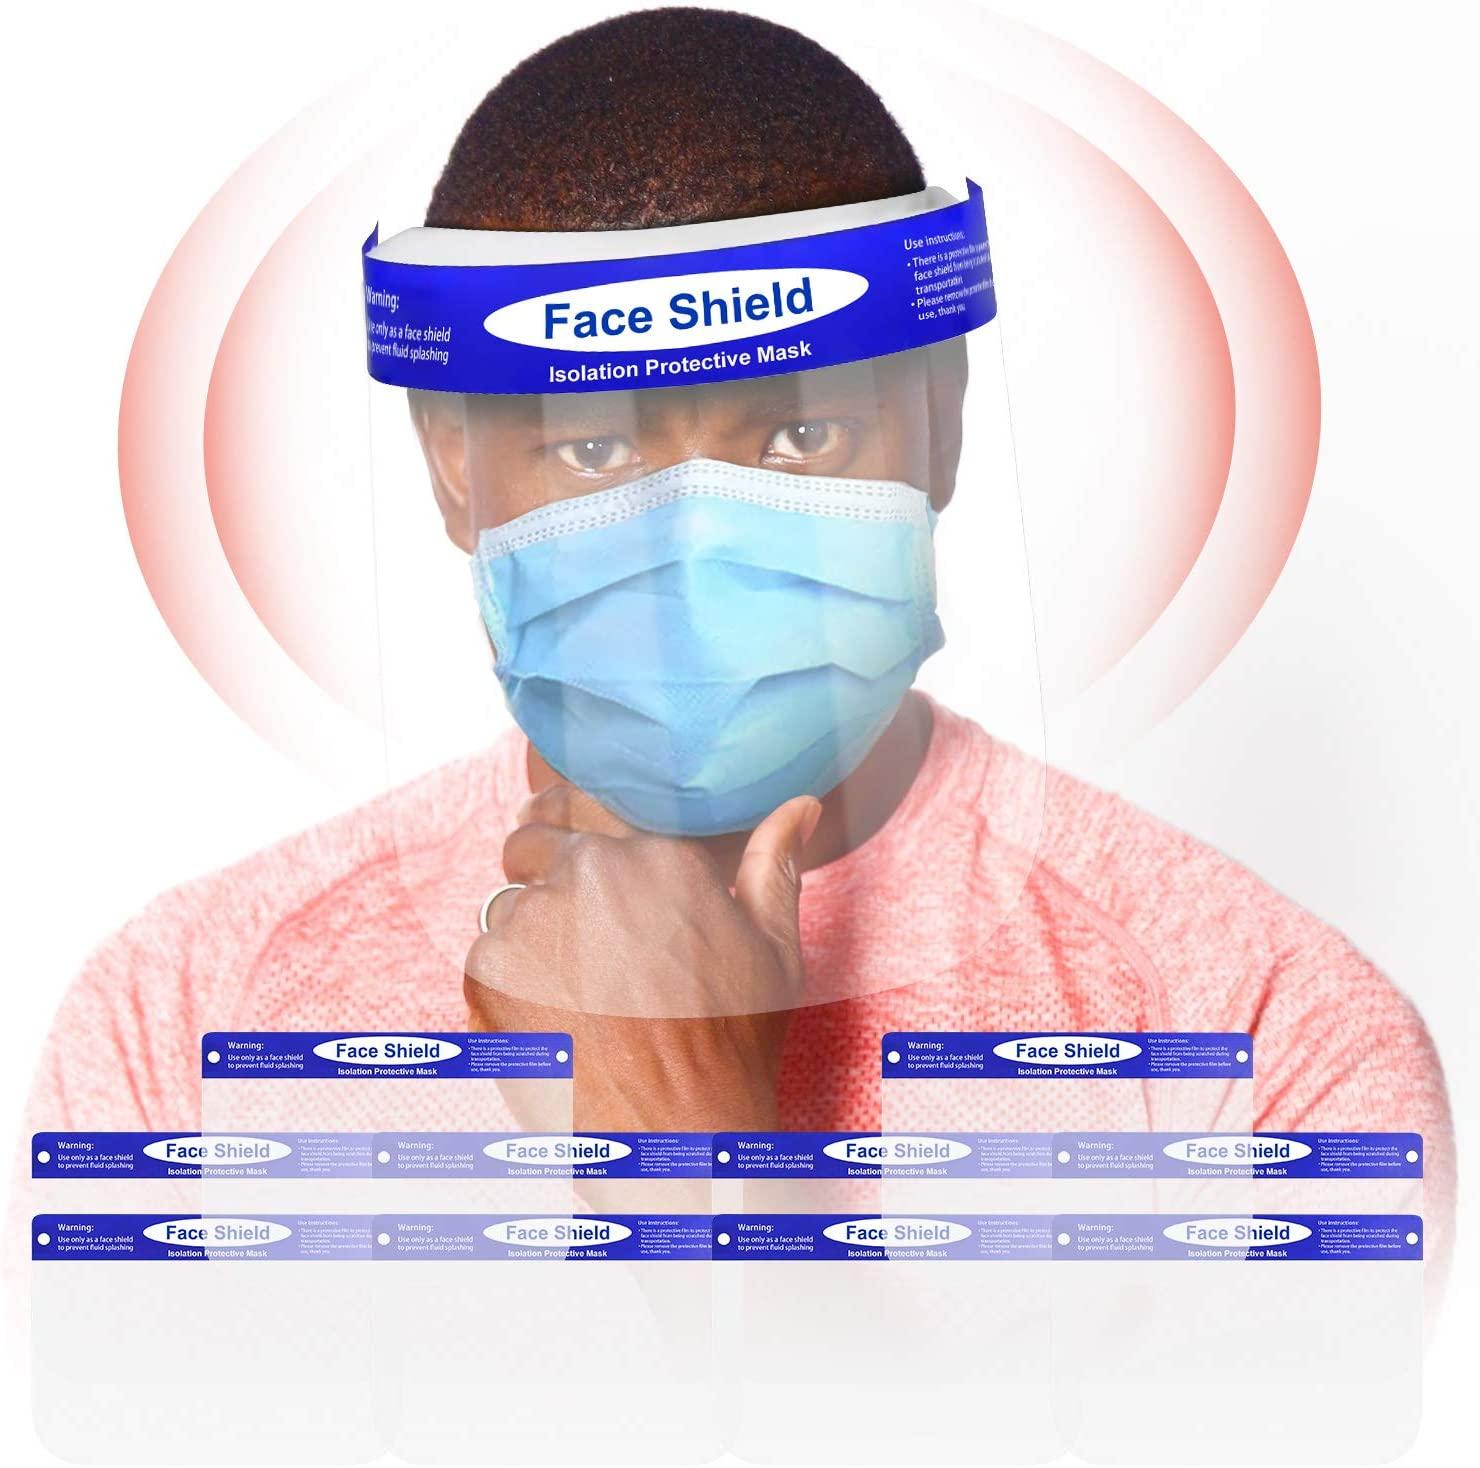 flufluf 10PCS Face Shields Anti-Fog Full Safety Face Shield,Universal Reusable Face Protective Visor for Eye Head Protection,Anti-Spitting Splash Facial